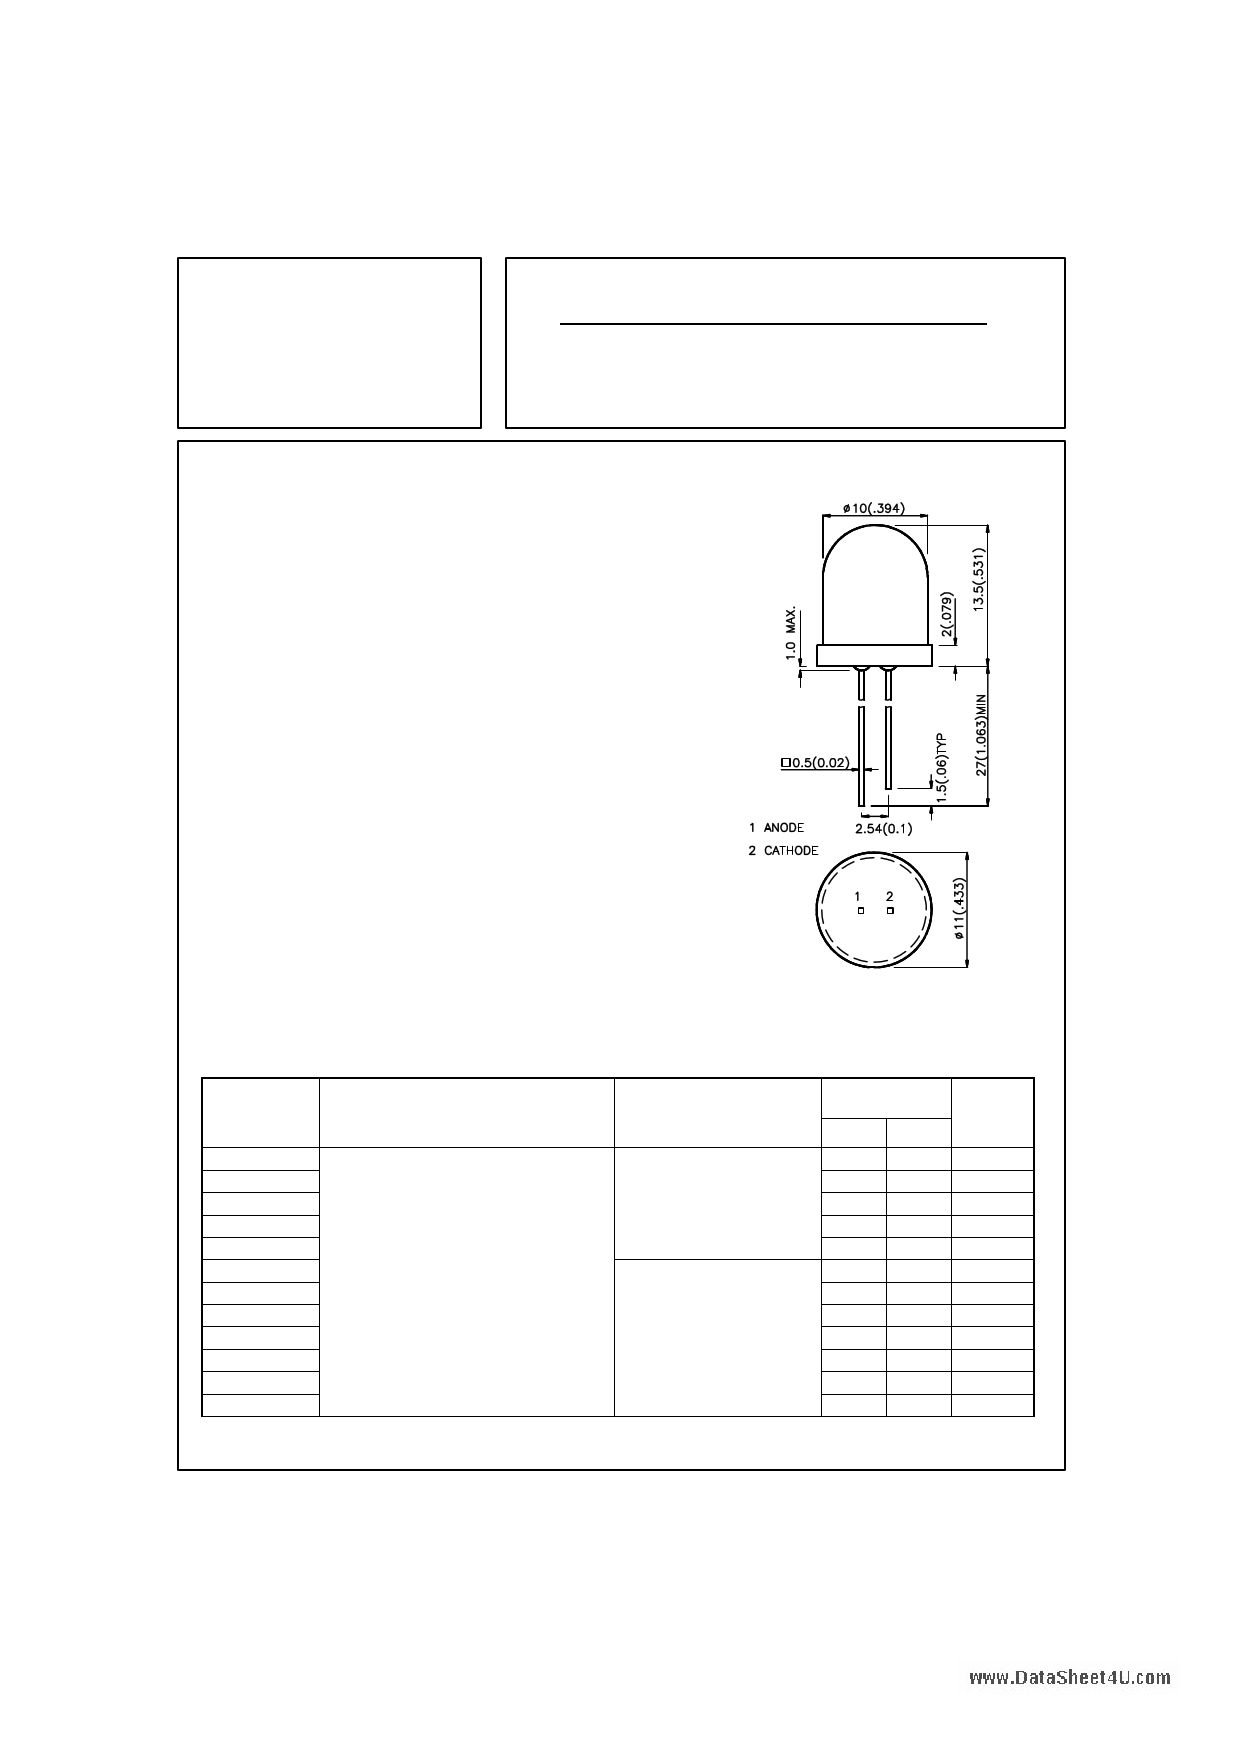 L-813SR datasheet